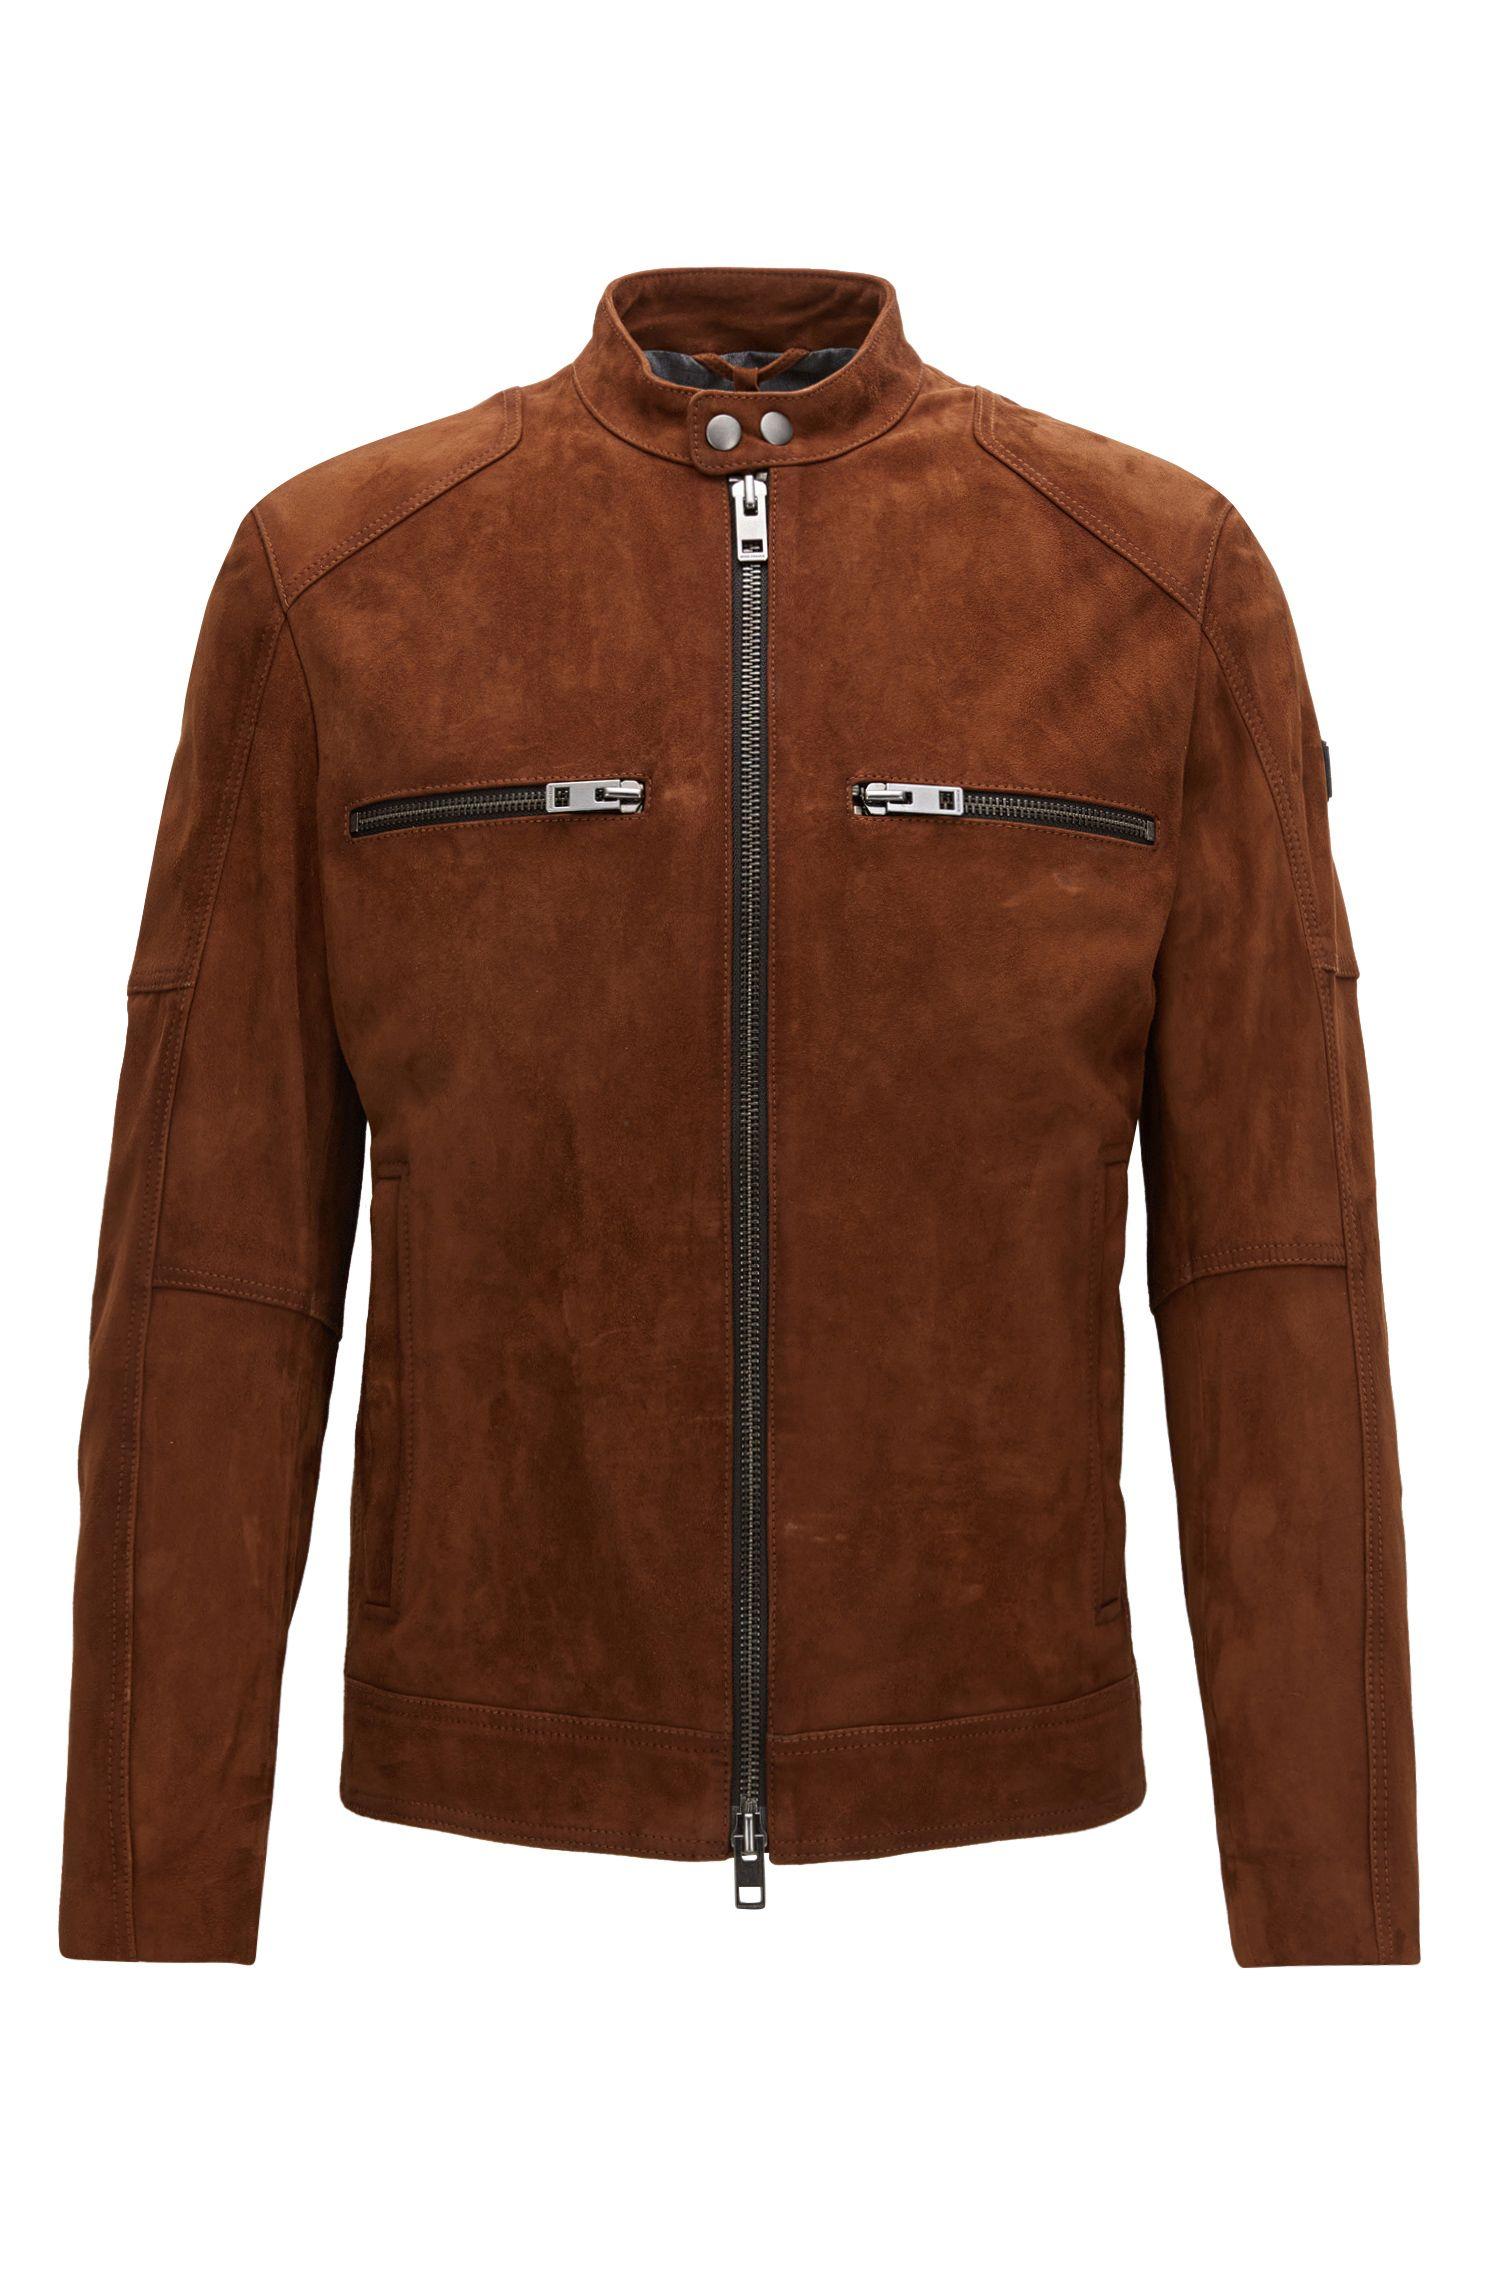 'Jeeazy' | Suede Biker Jacket